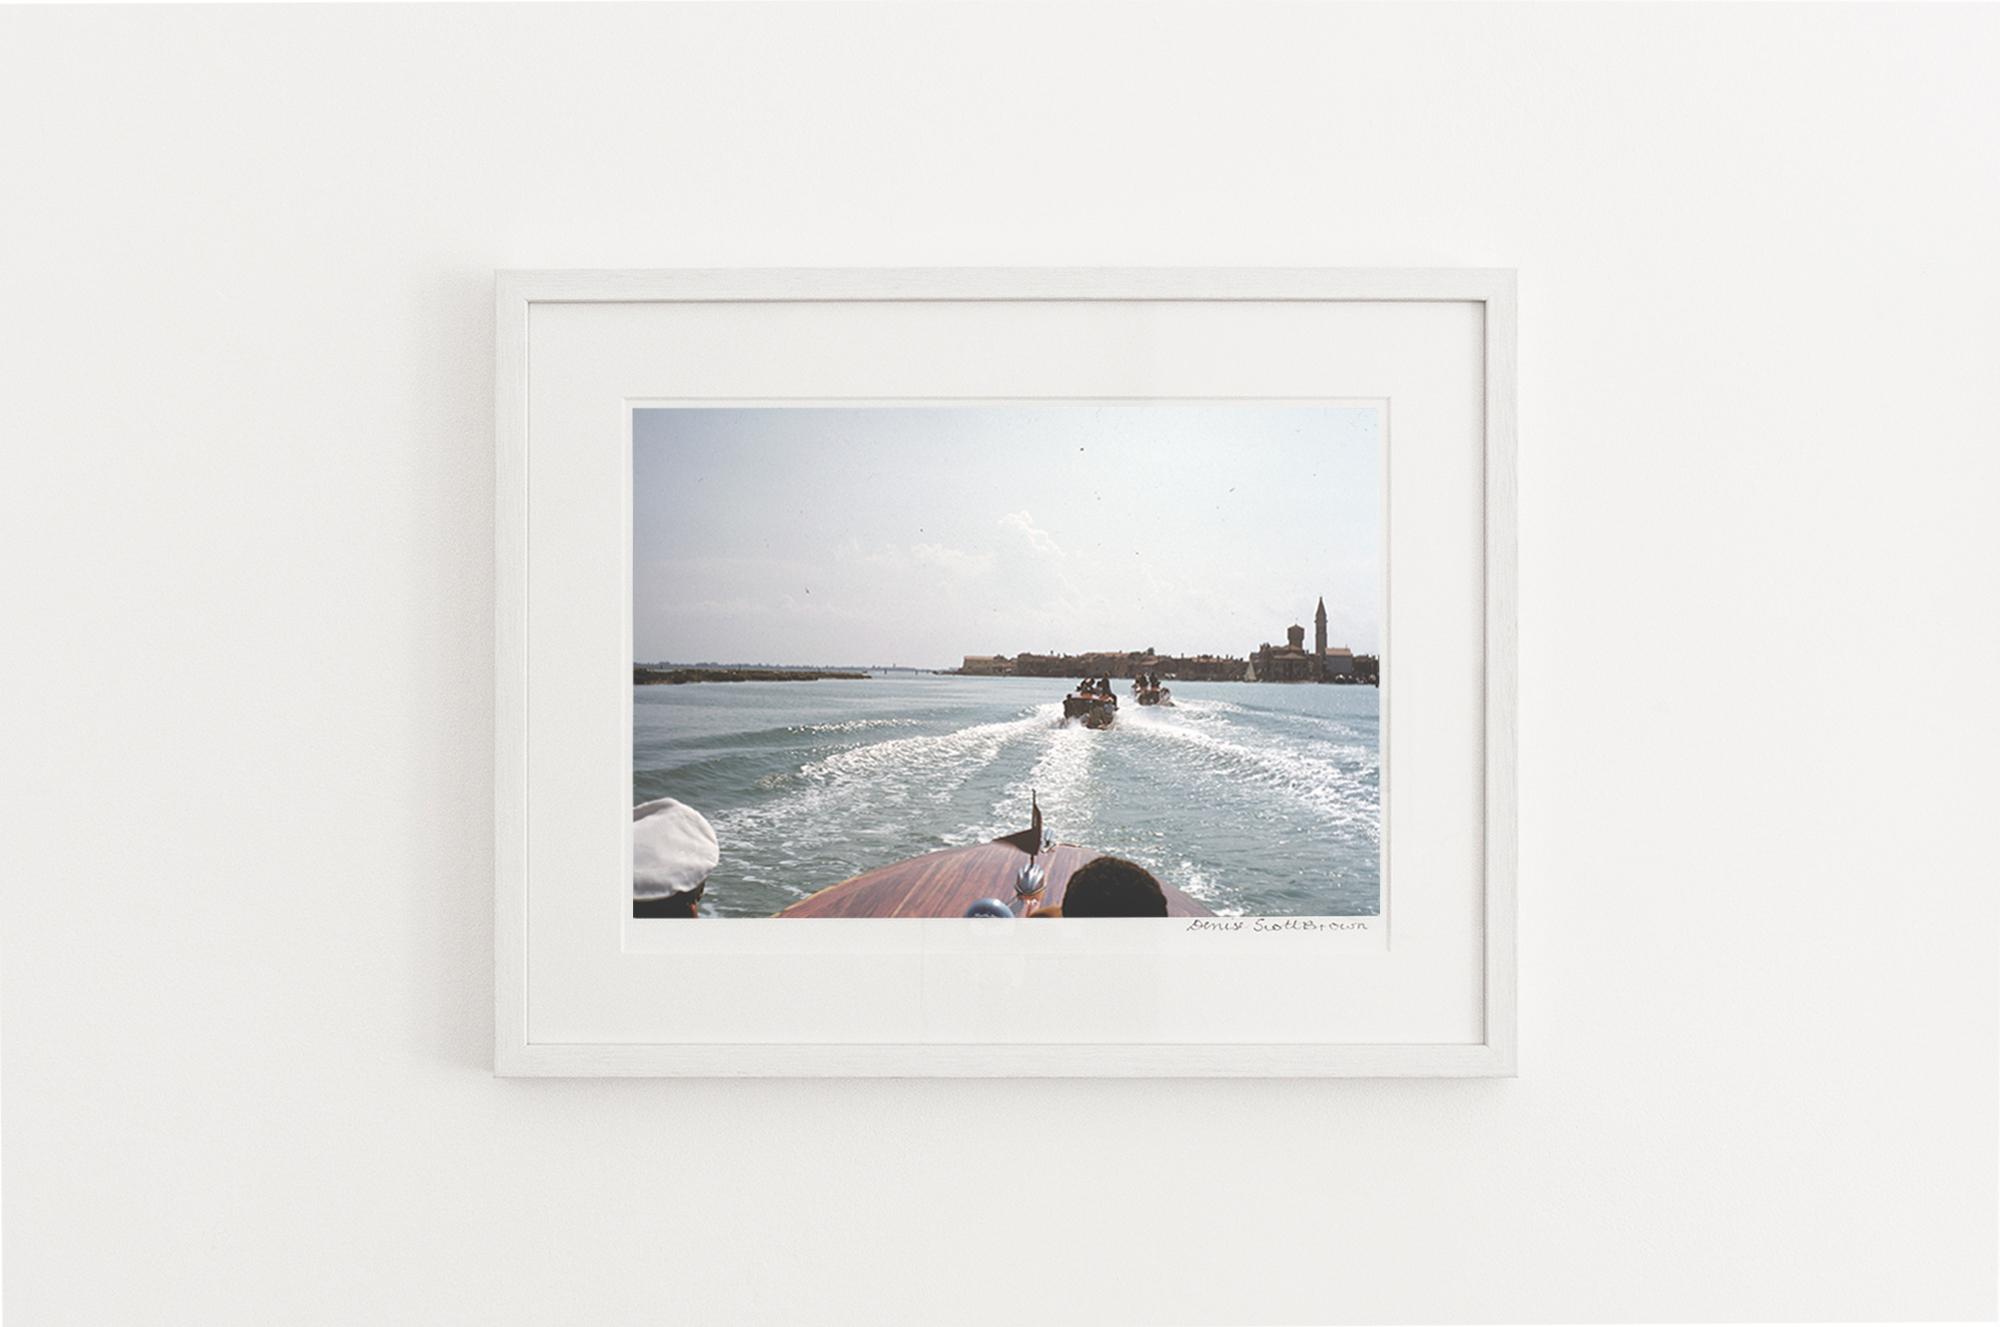 Lagoon, Venice , 1956. Giclée pigment on Hahnemuhle archivalpaper, 45.5 x 30.3 cm (framed), Edition of 10